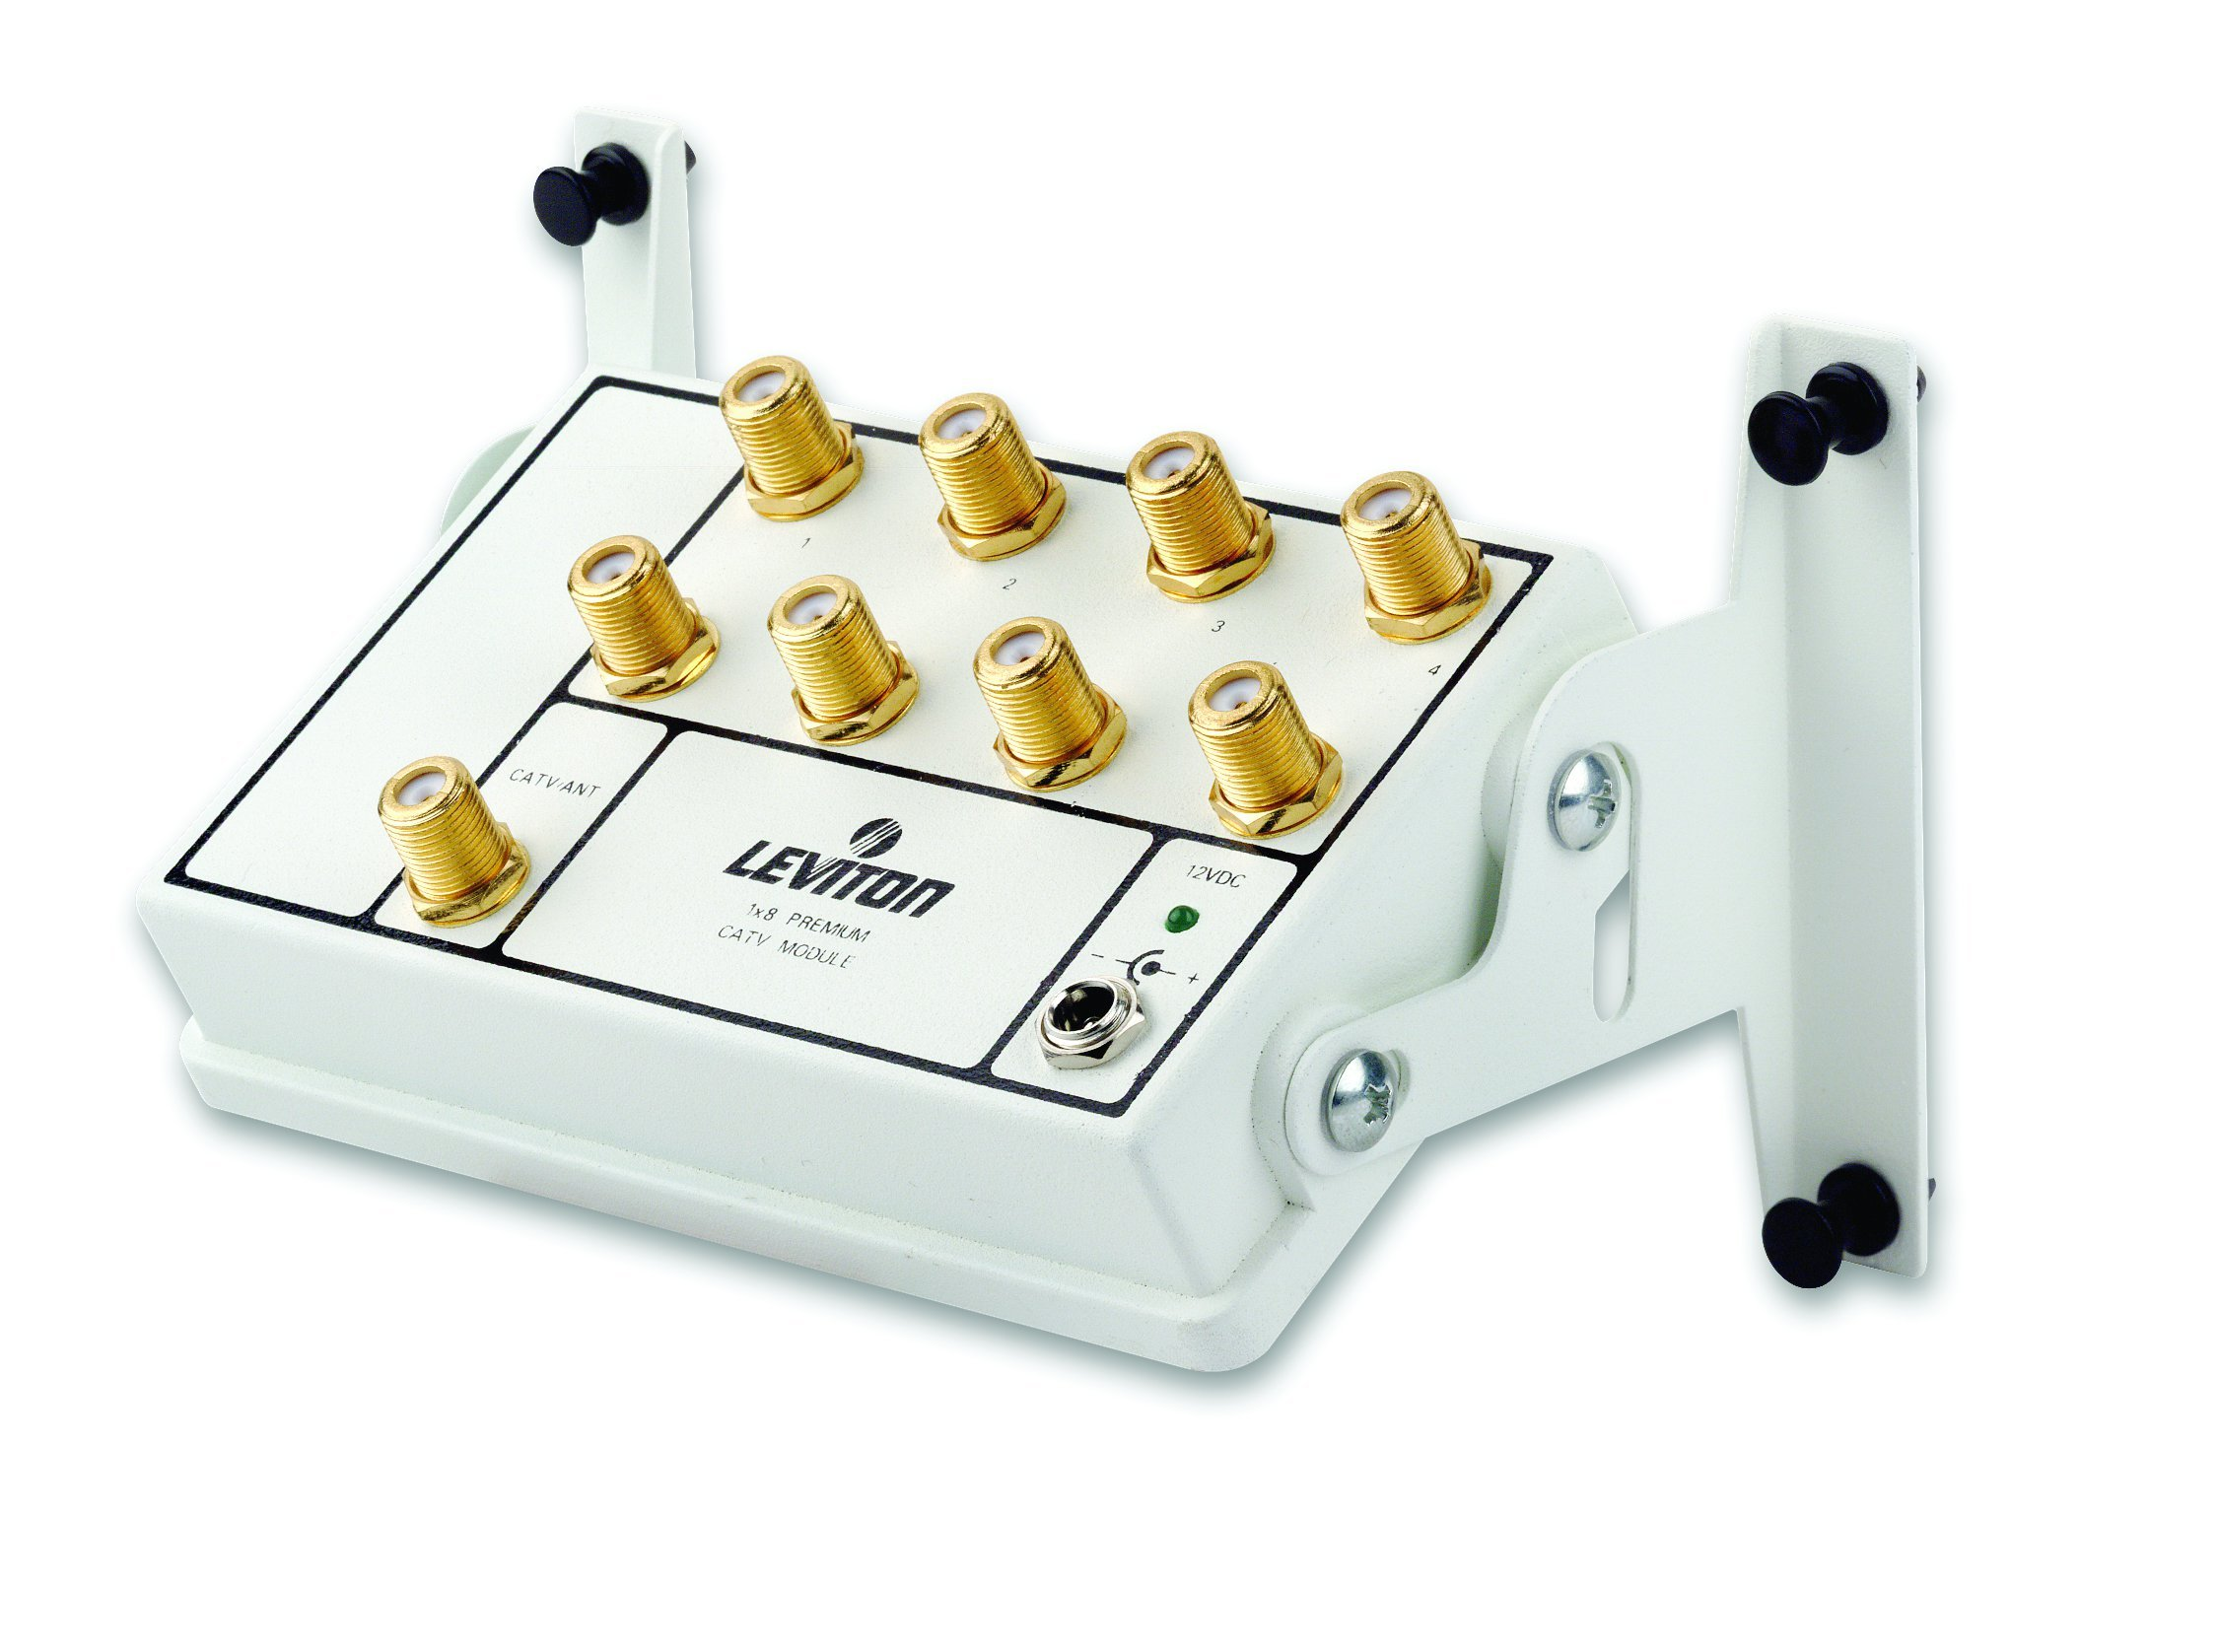 Leviton 47693-8P 1x8 Premium Amplified CATV Module by Leviton